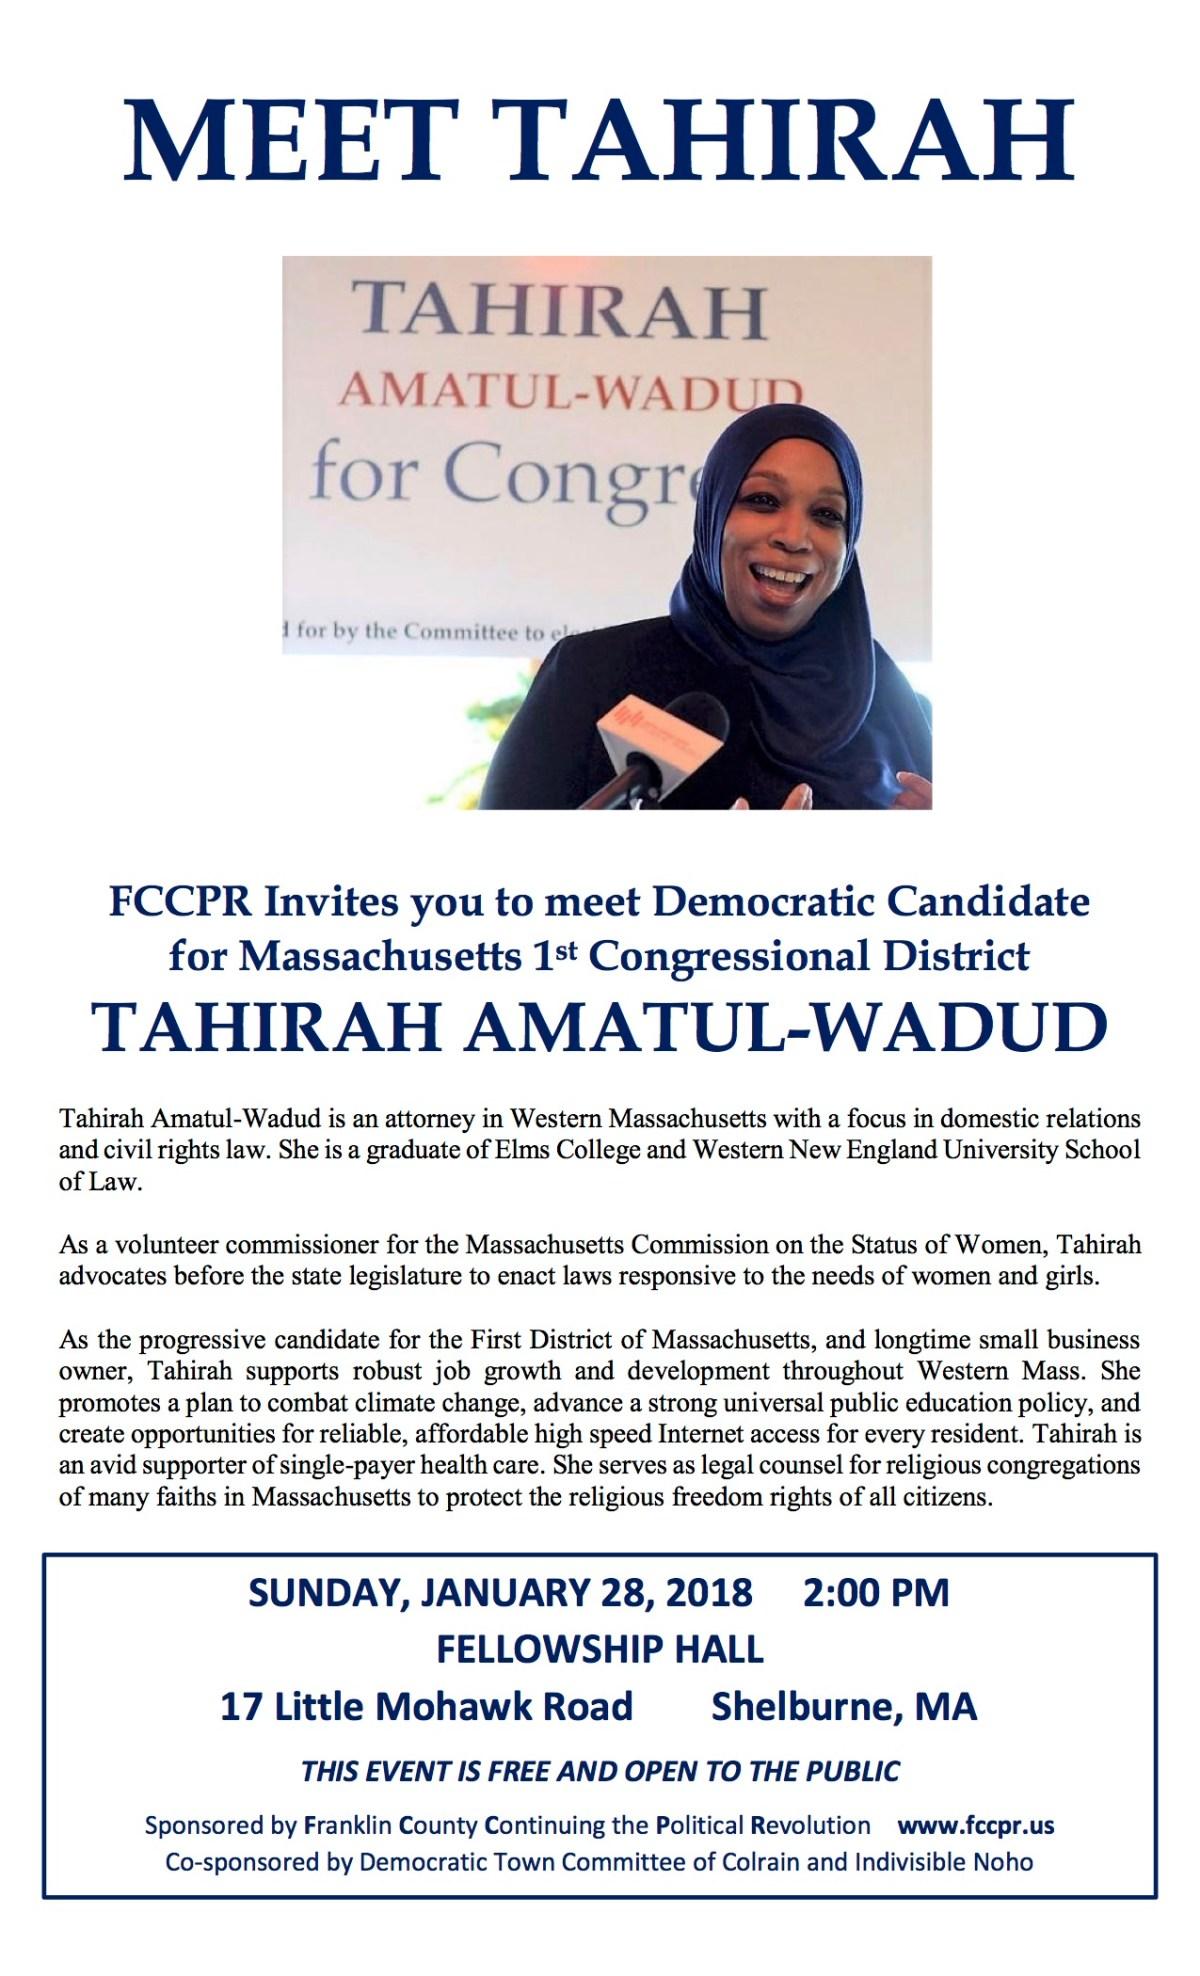 Meet Tahirah Amatul-Wadud, Democratic Candidate for Massachusetts 1st Congressional District